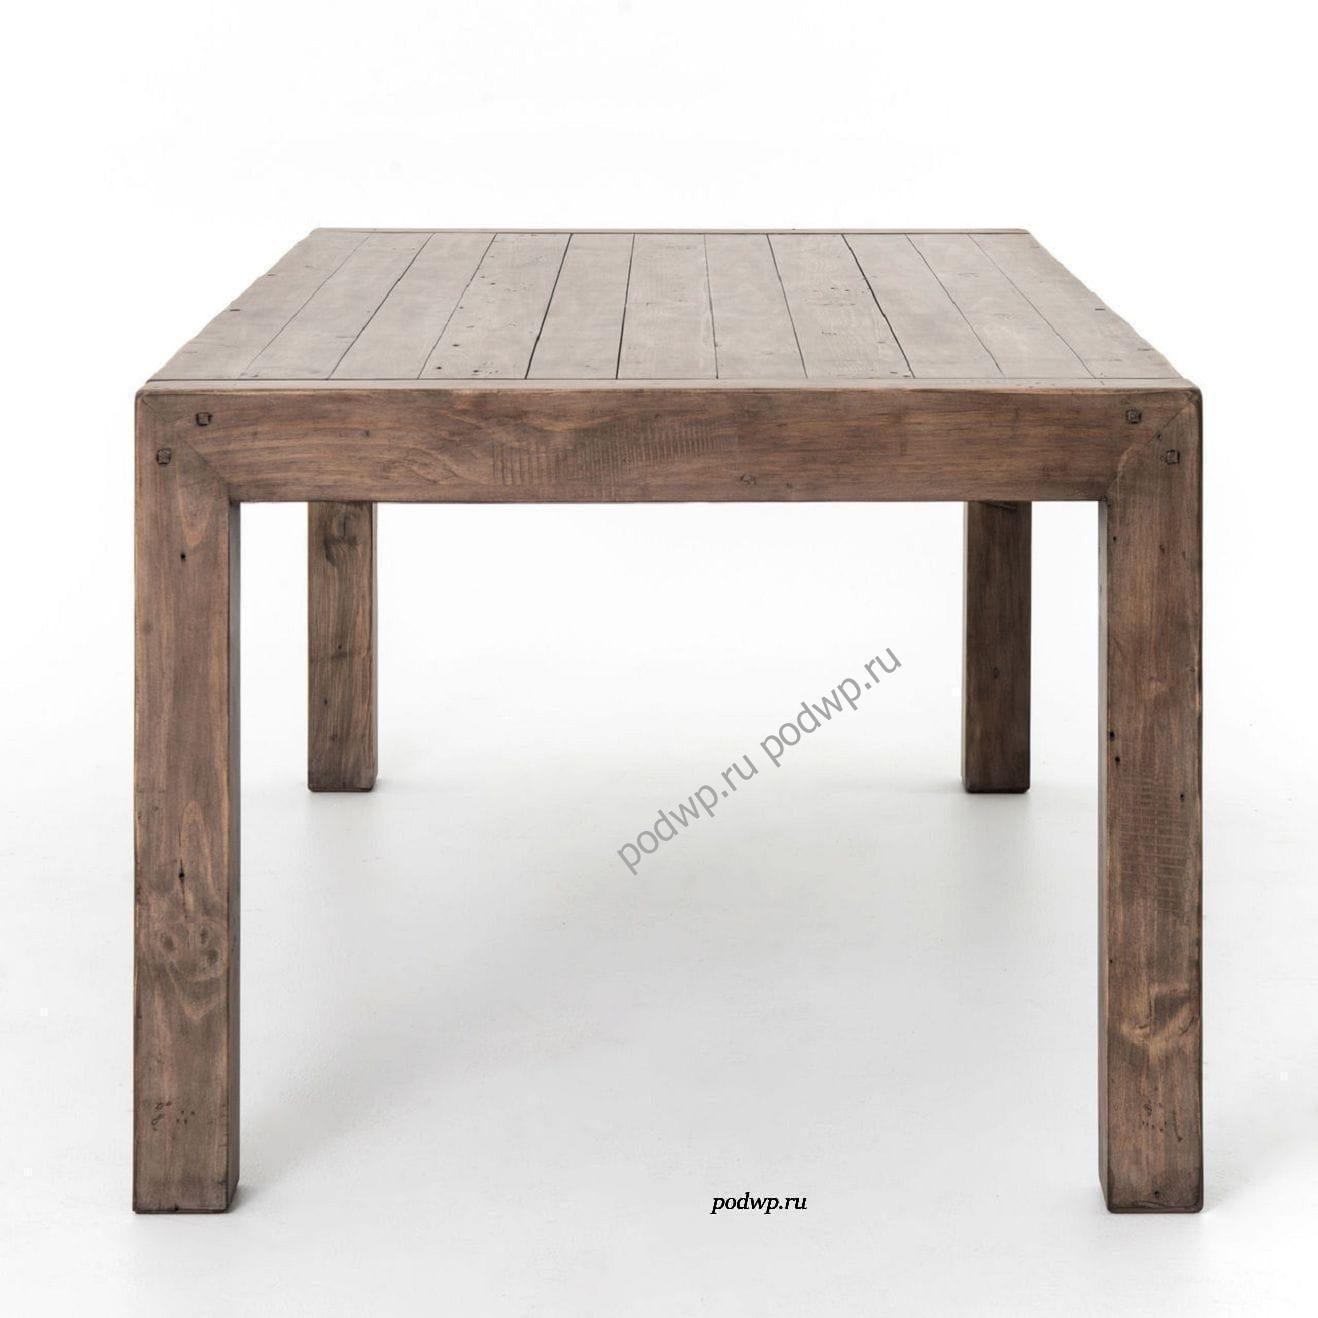 bol-shoj-derevyanny-j-obedenny-j-stol-parsons-dining-table-8